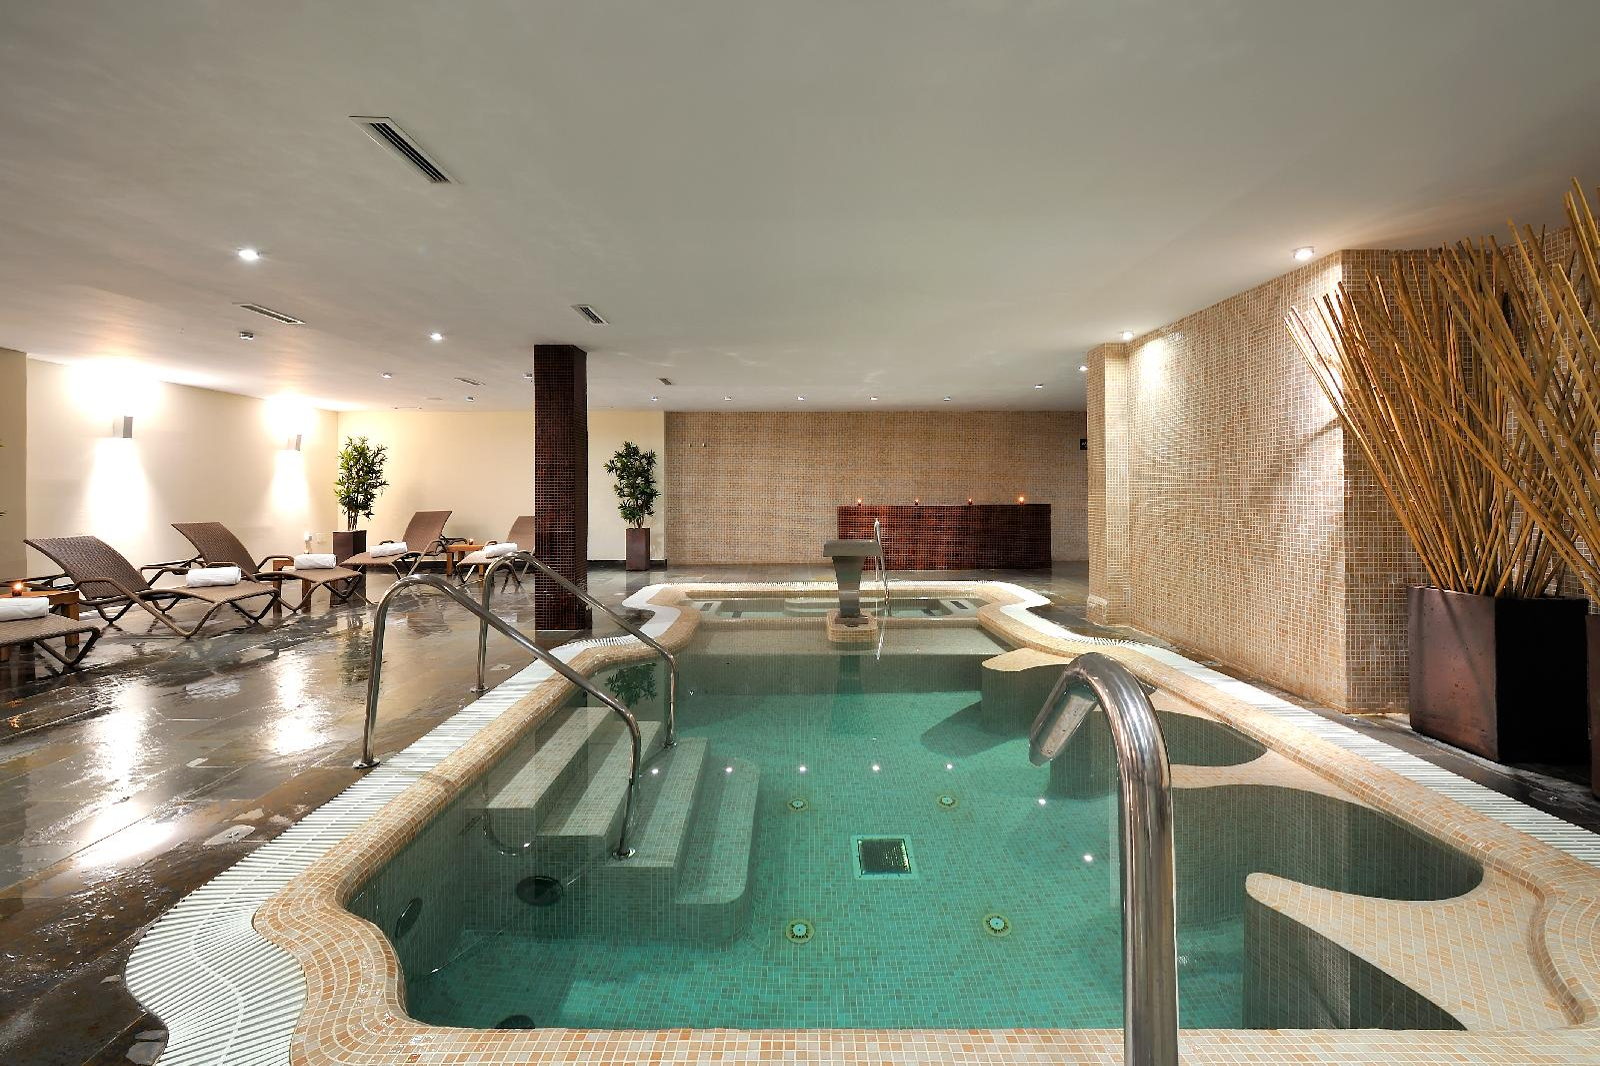 Vincci Resort Costa Golf en Urbanizaci n Novo Santi Petri Costa